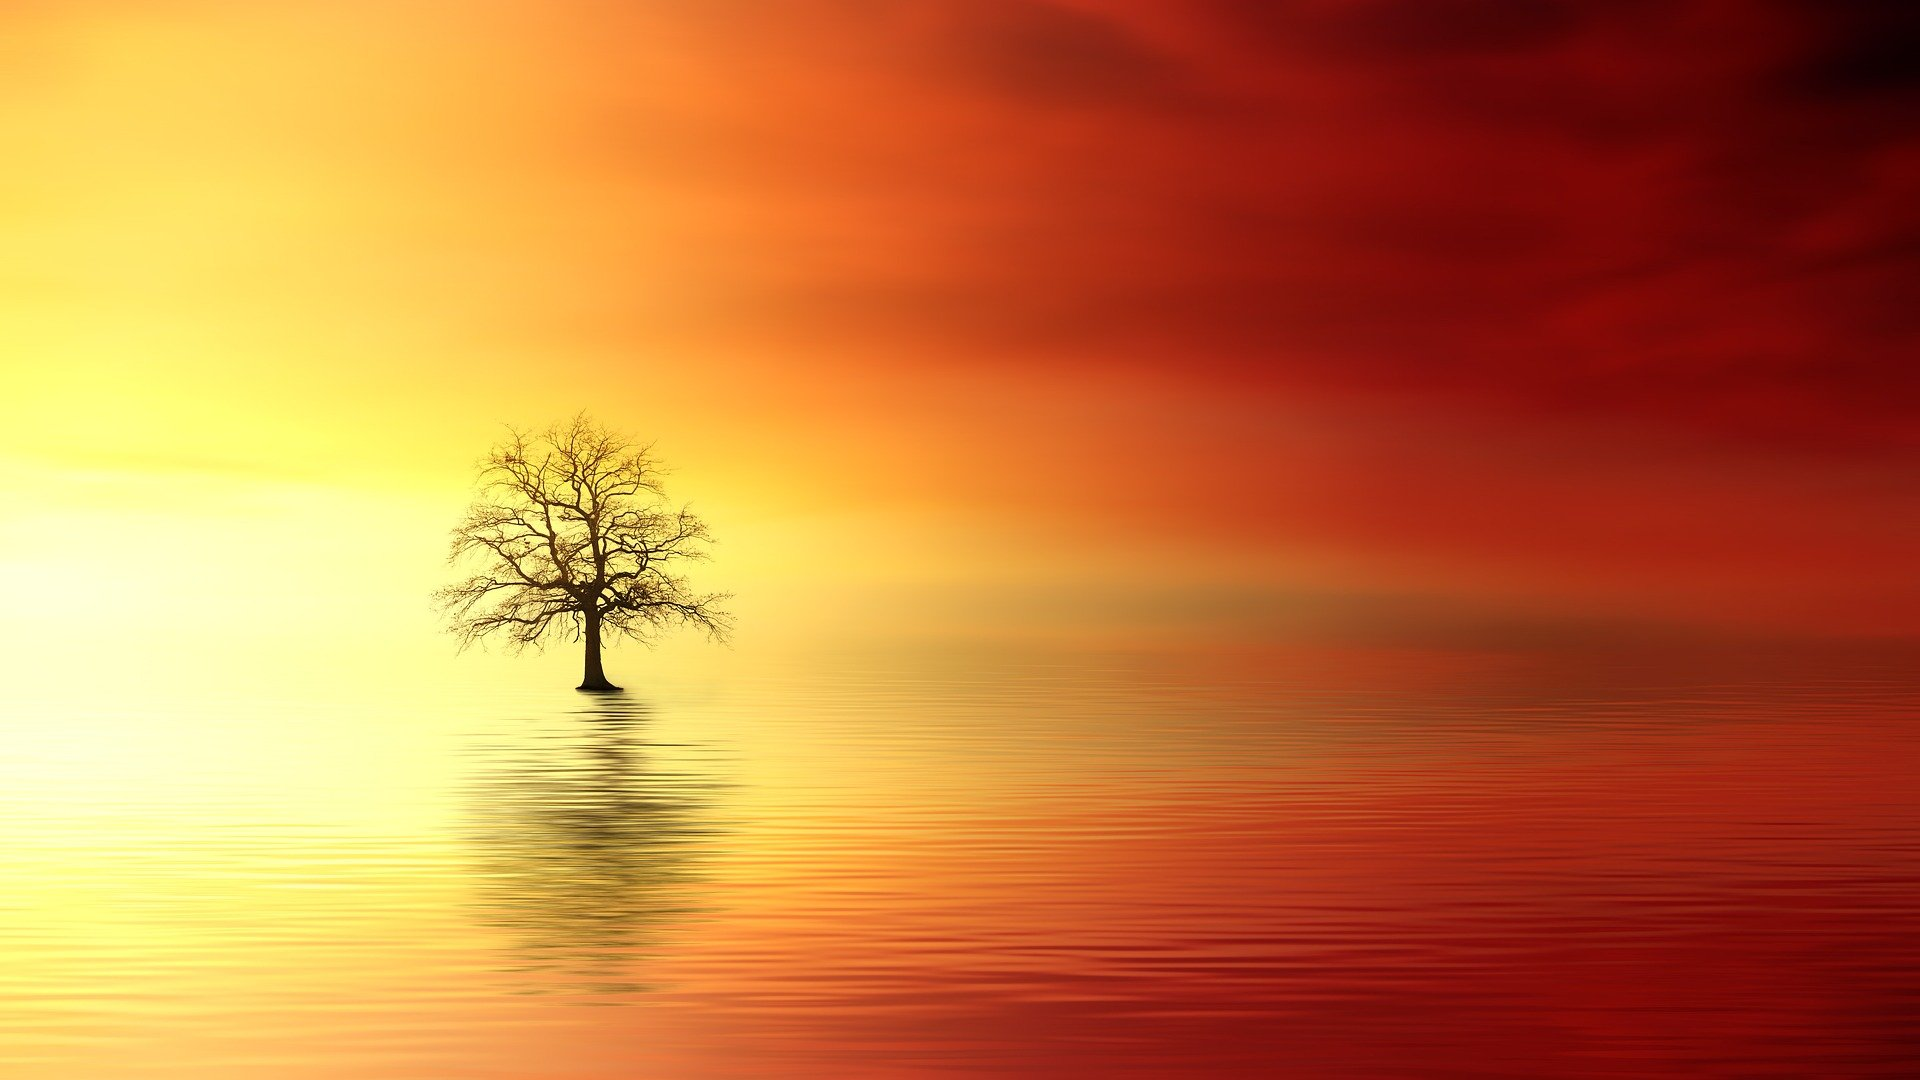 sunset-3156440_1920 (1)